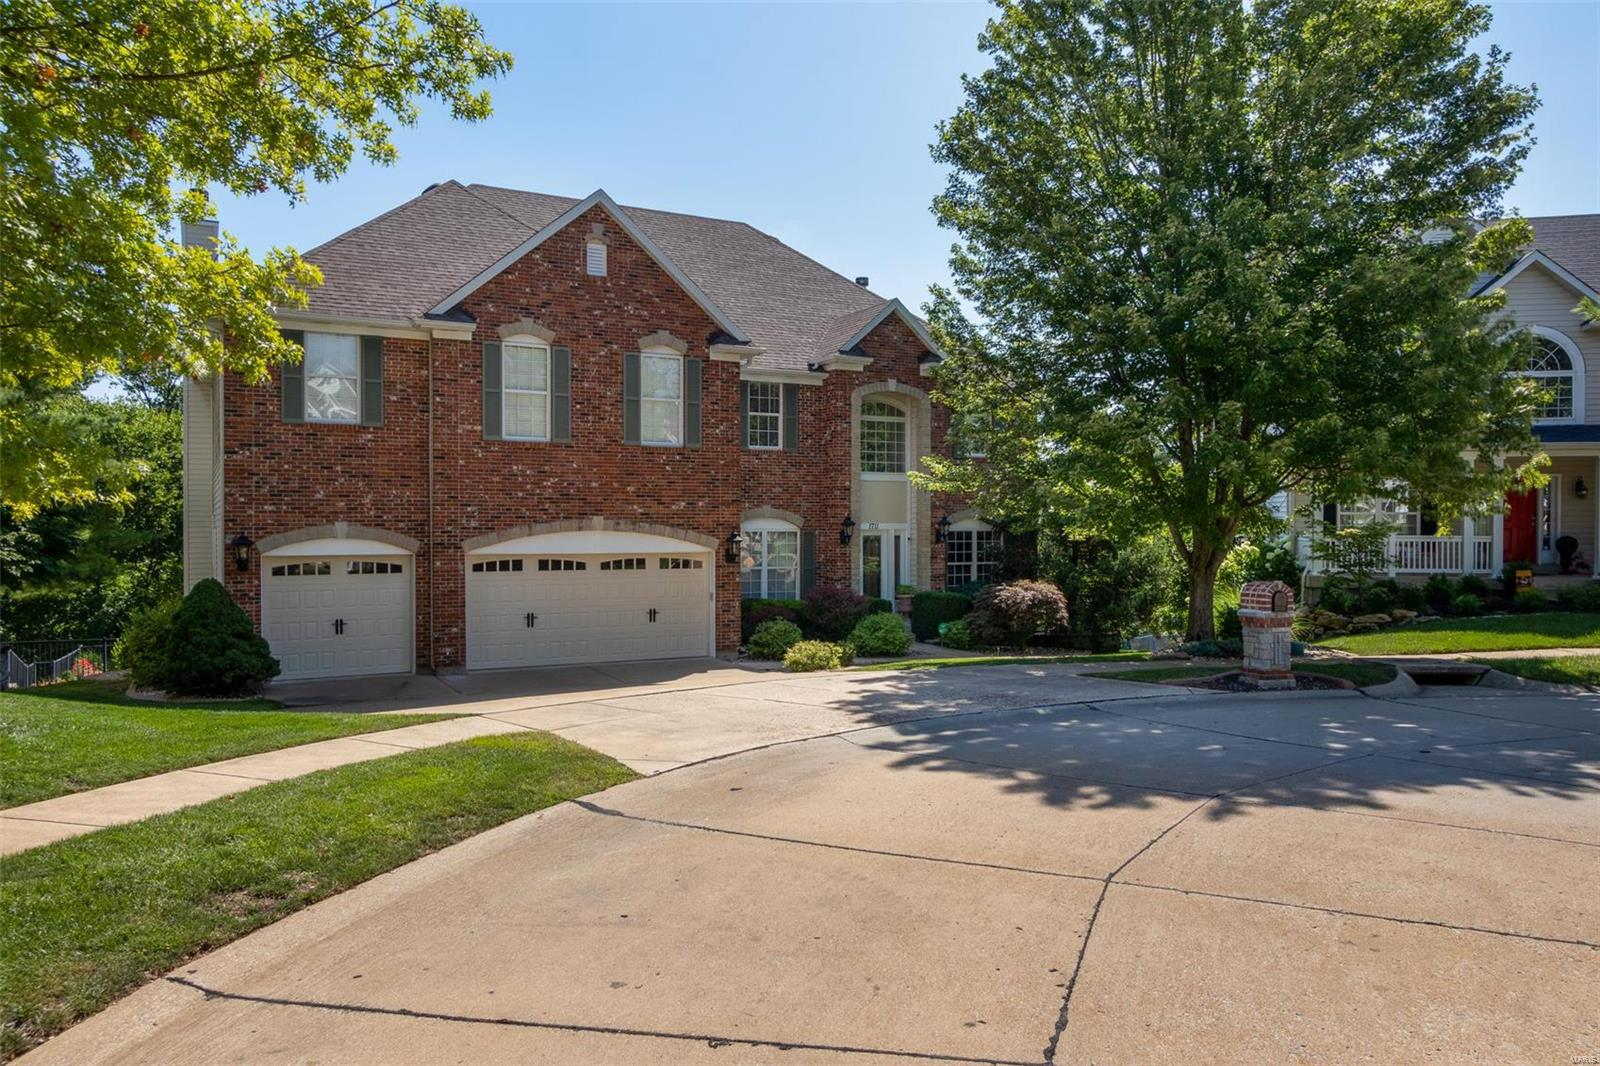 1711 Carman Ridge Property Photo - Ballwin, MO real estate listing